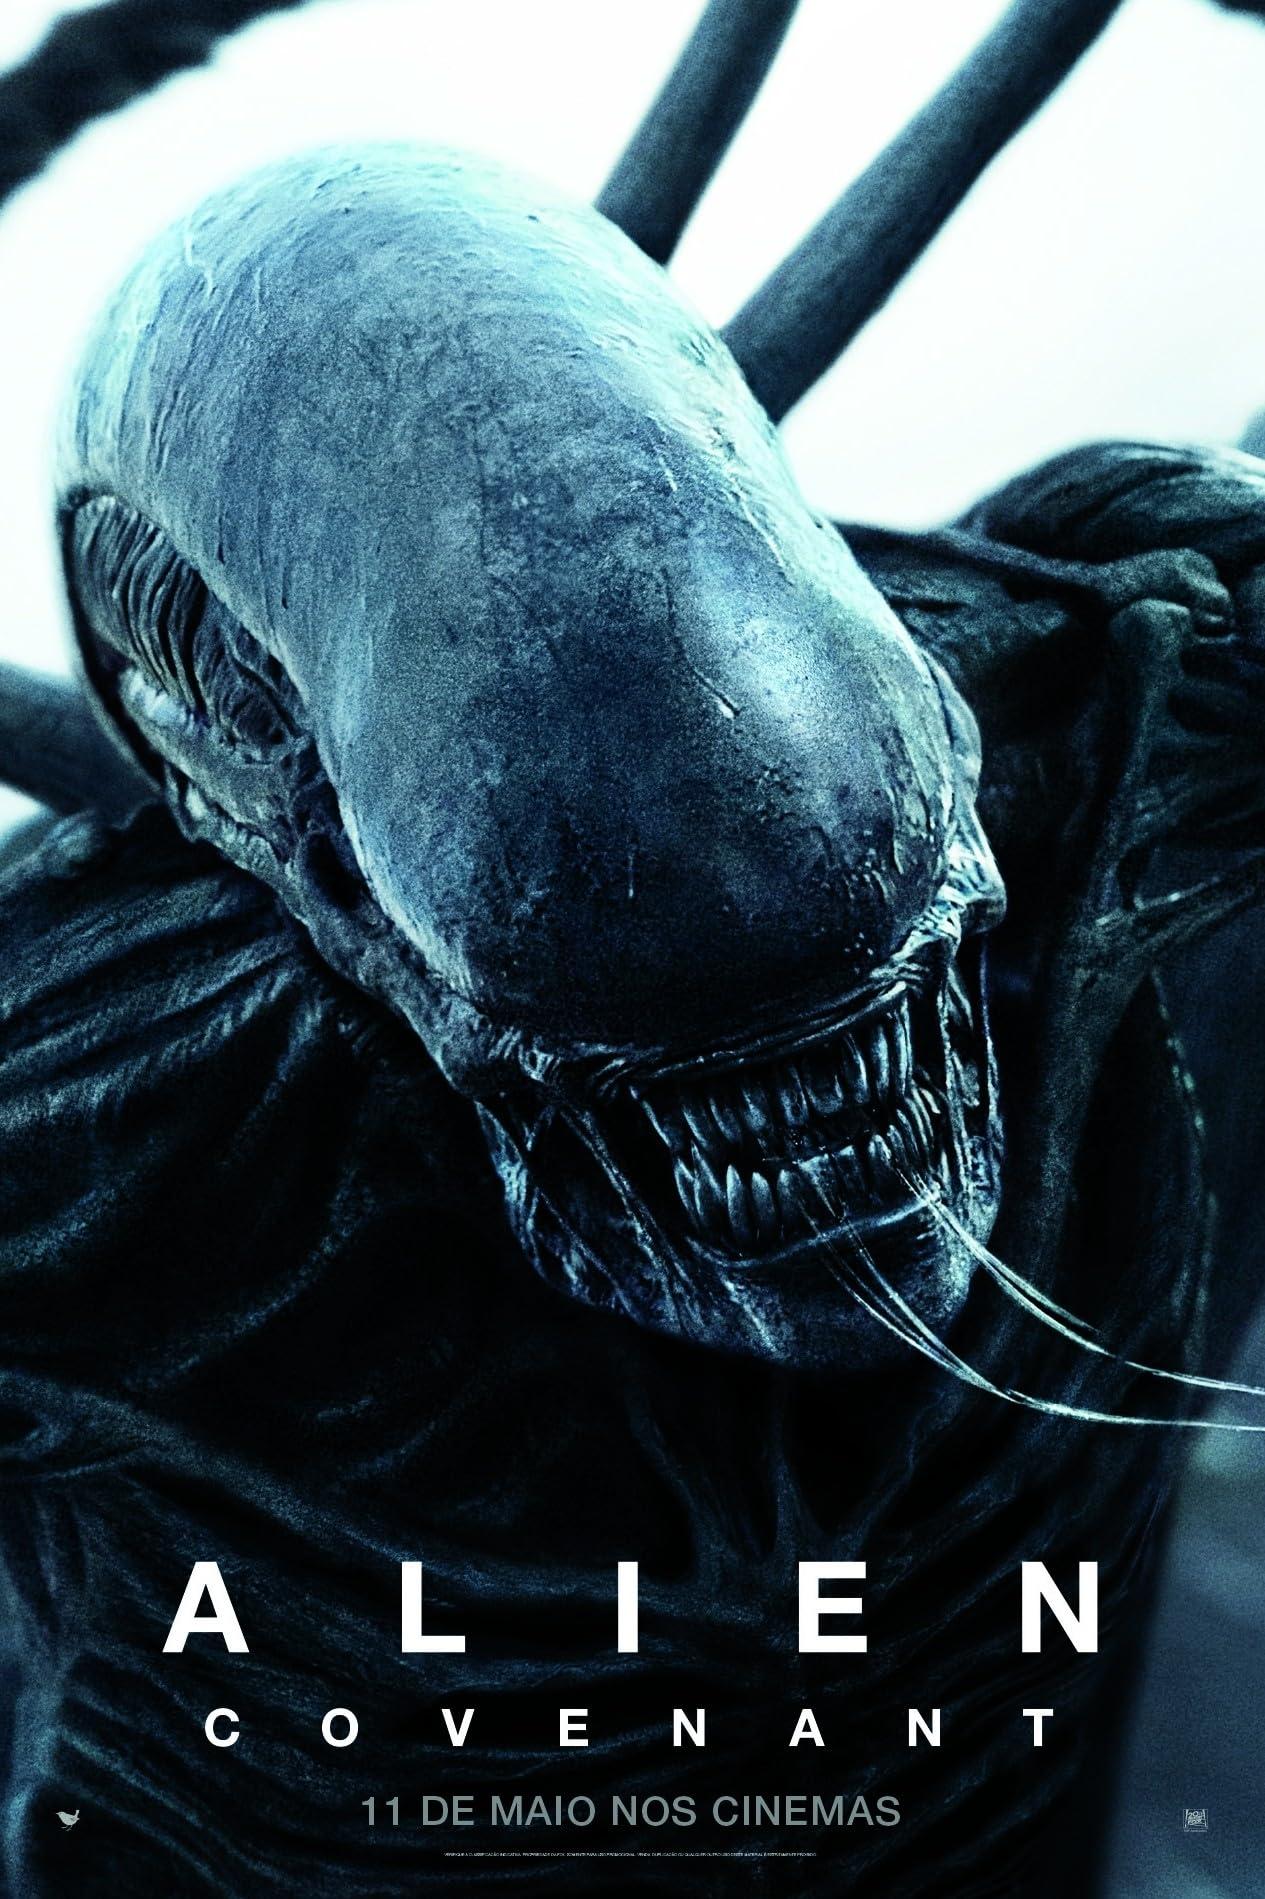 Alien: Covenant (2017) Hindi Dubbed